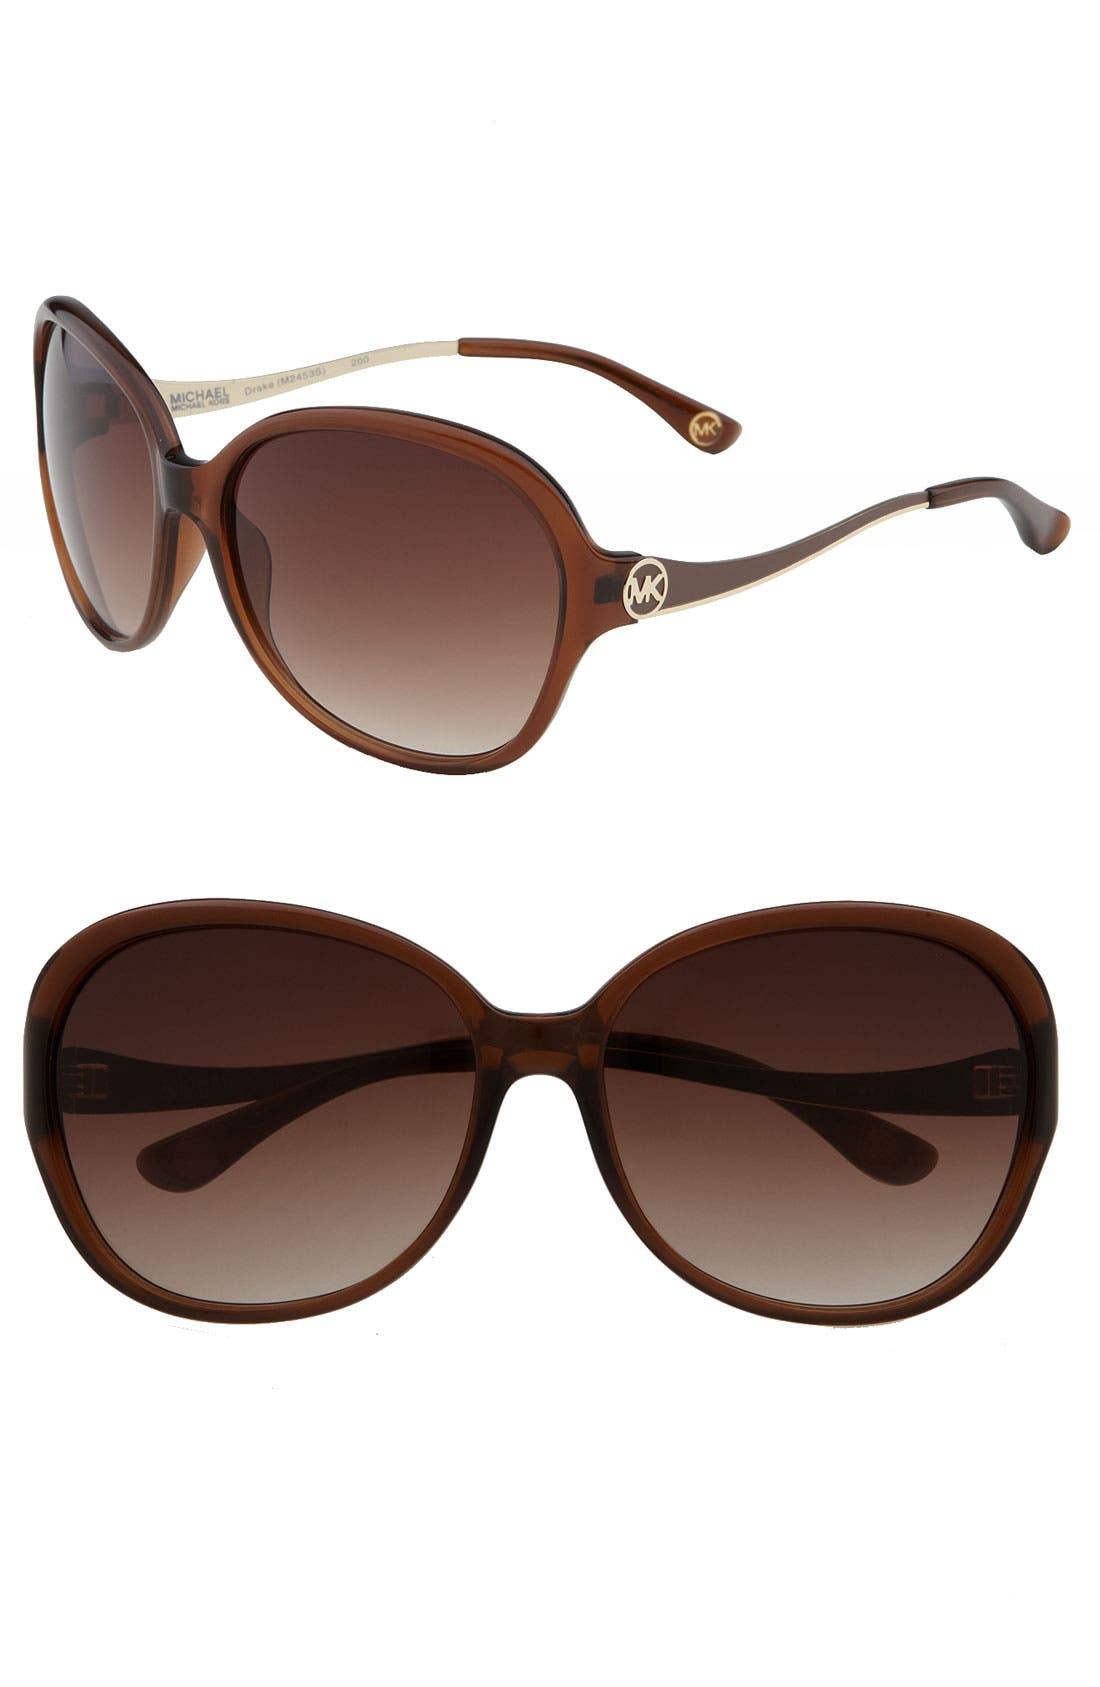 Alternate Image 1 Selected - MICHAEL Michael Kors 'Drake' Oversized Round Sunglasses